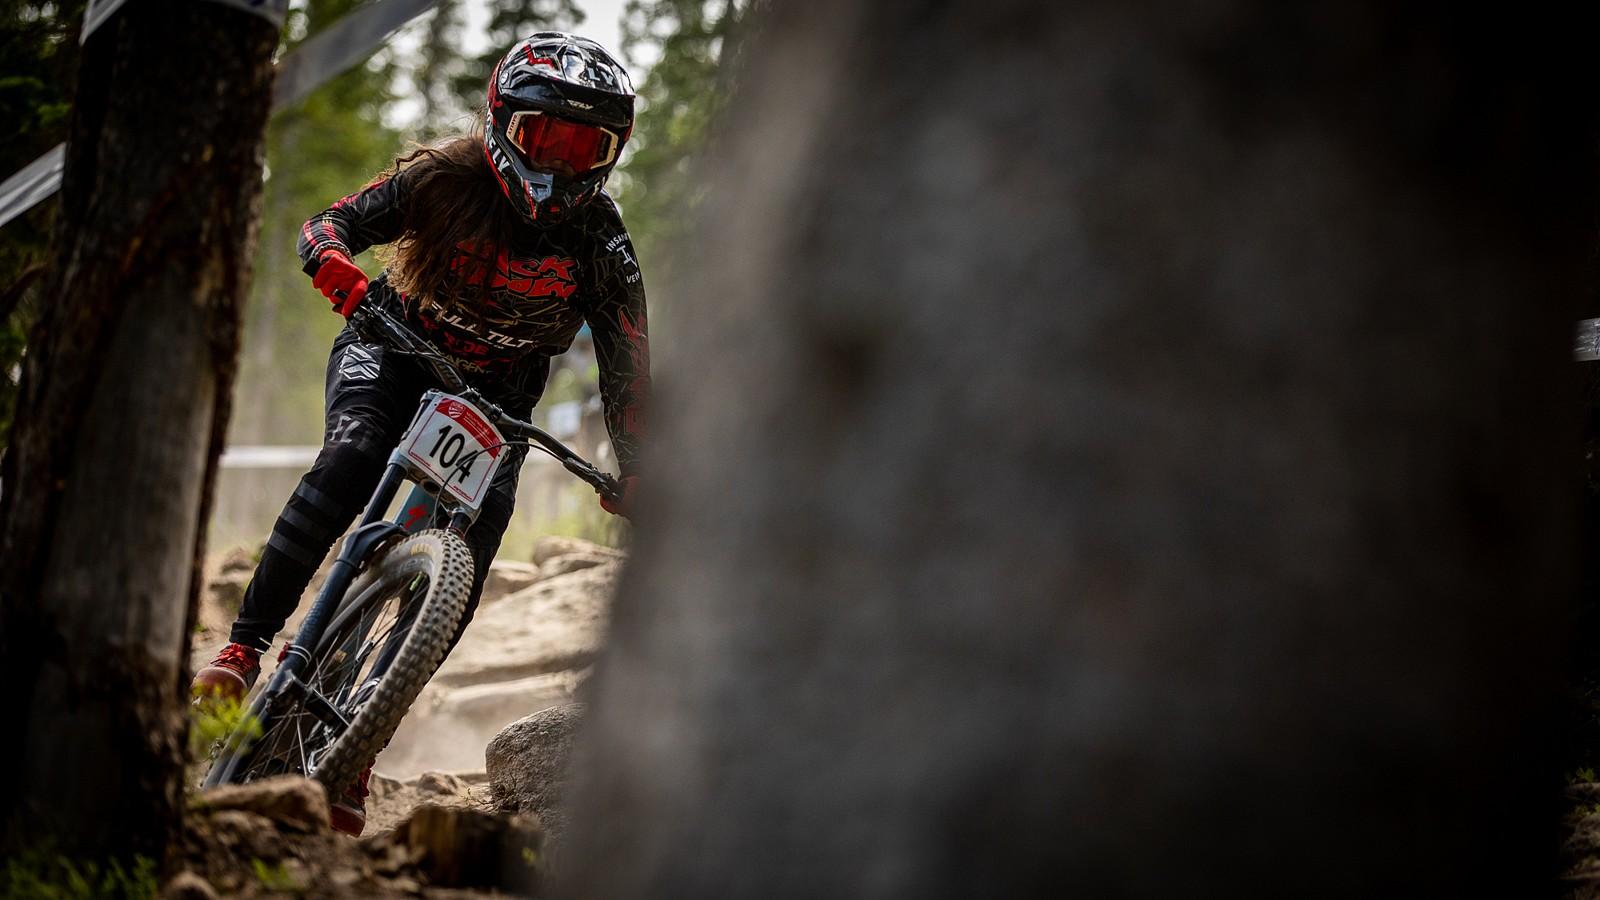 Caitlyn Farmer - US National Champs Downhill Photo Blast - Mountain Biking Pictures - Vital MTB